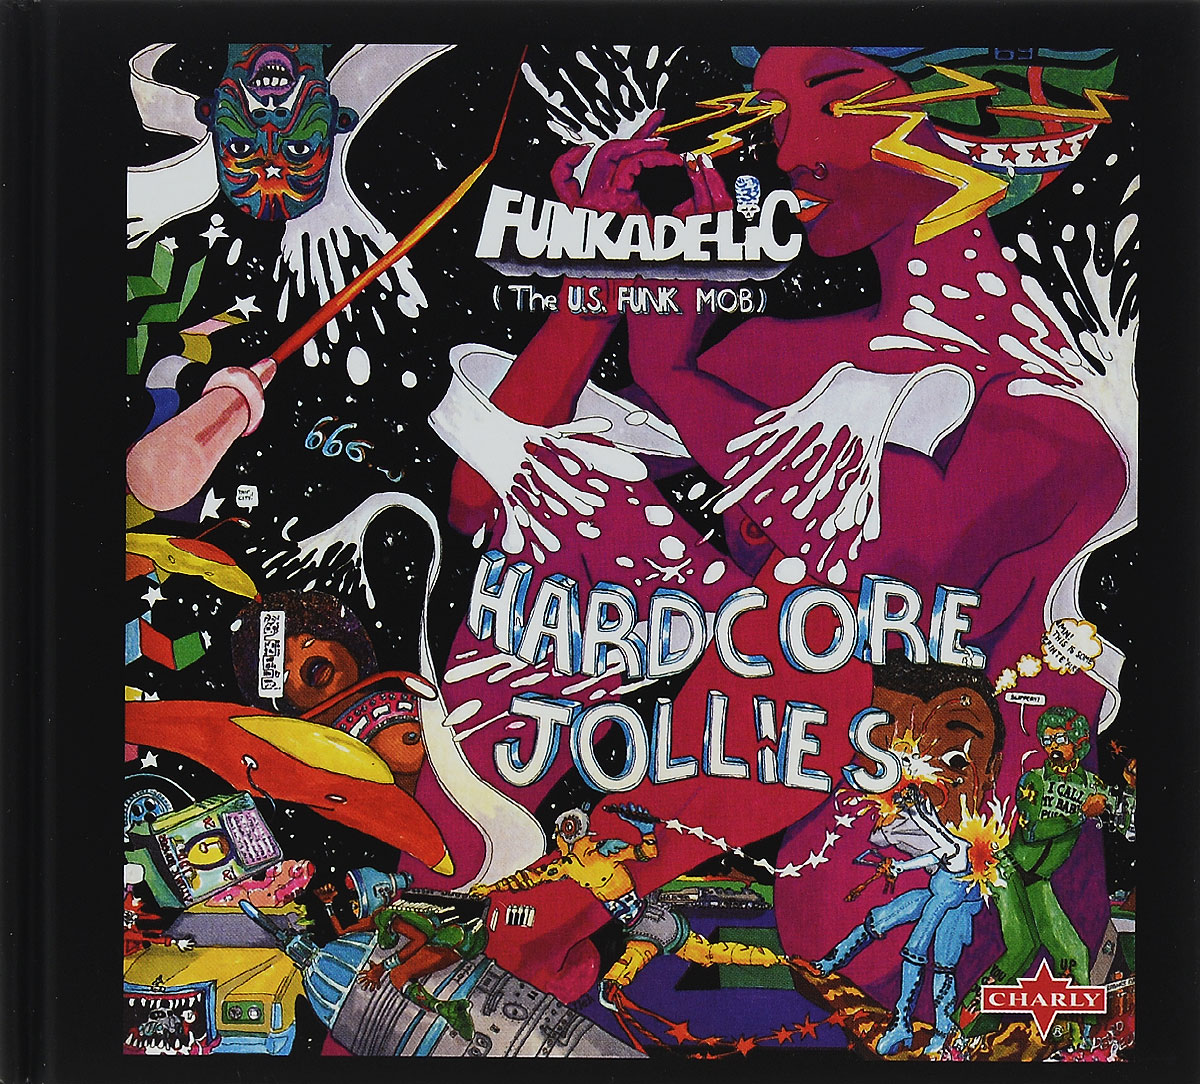 Funkadelic. Hardcore Jollies